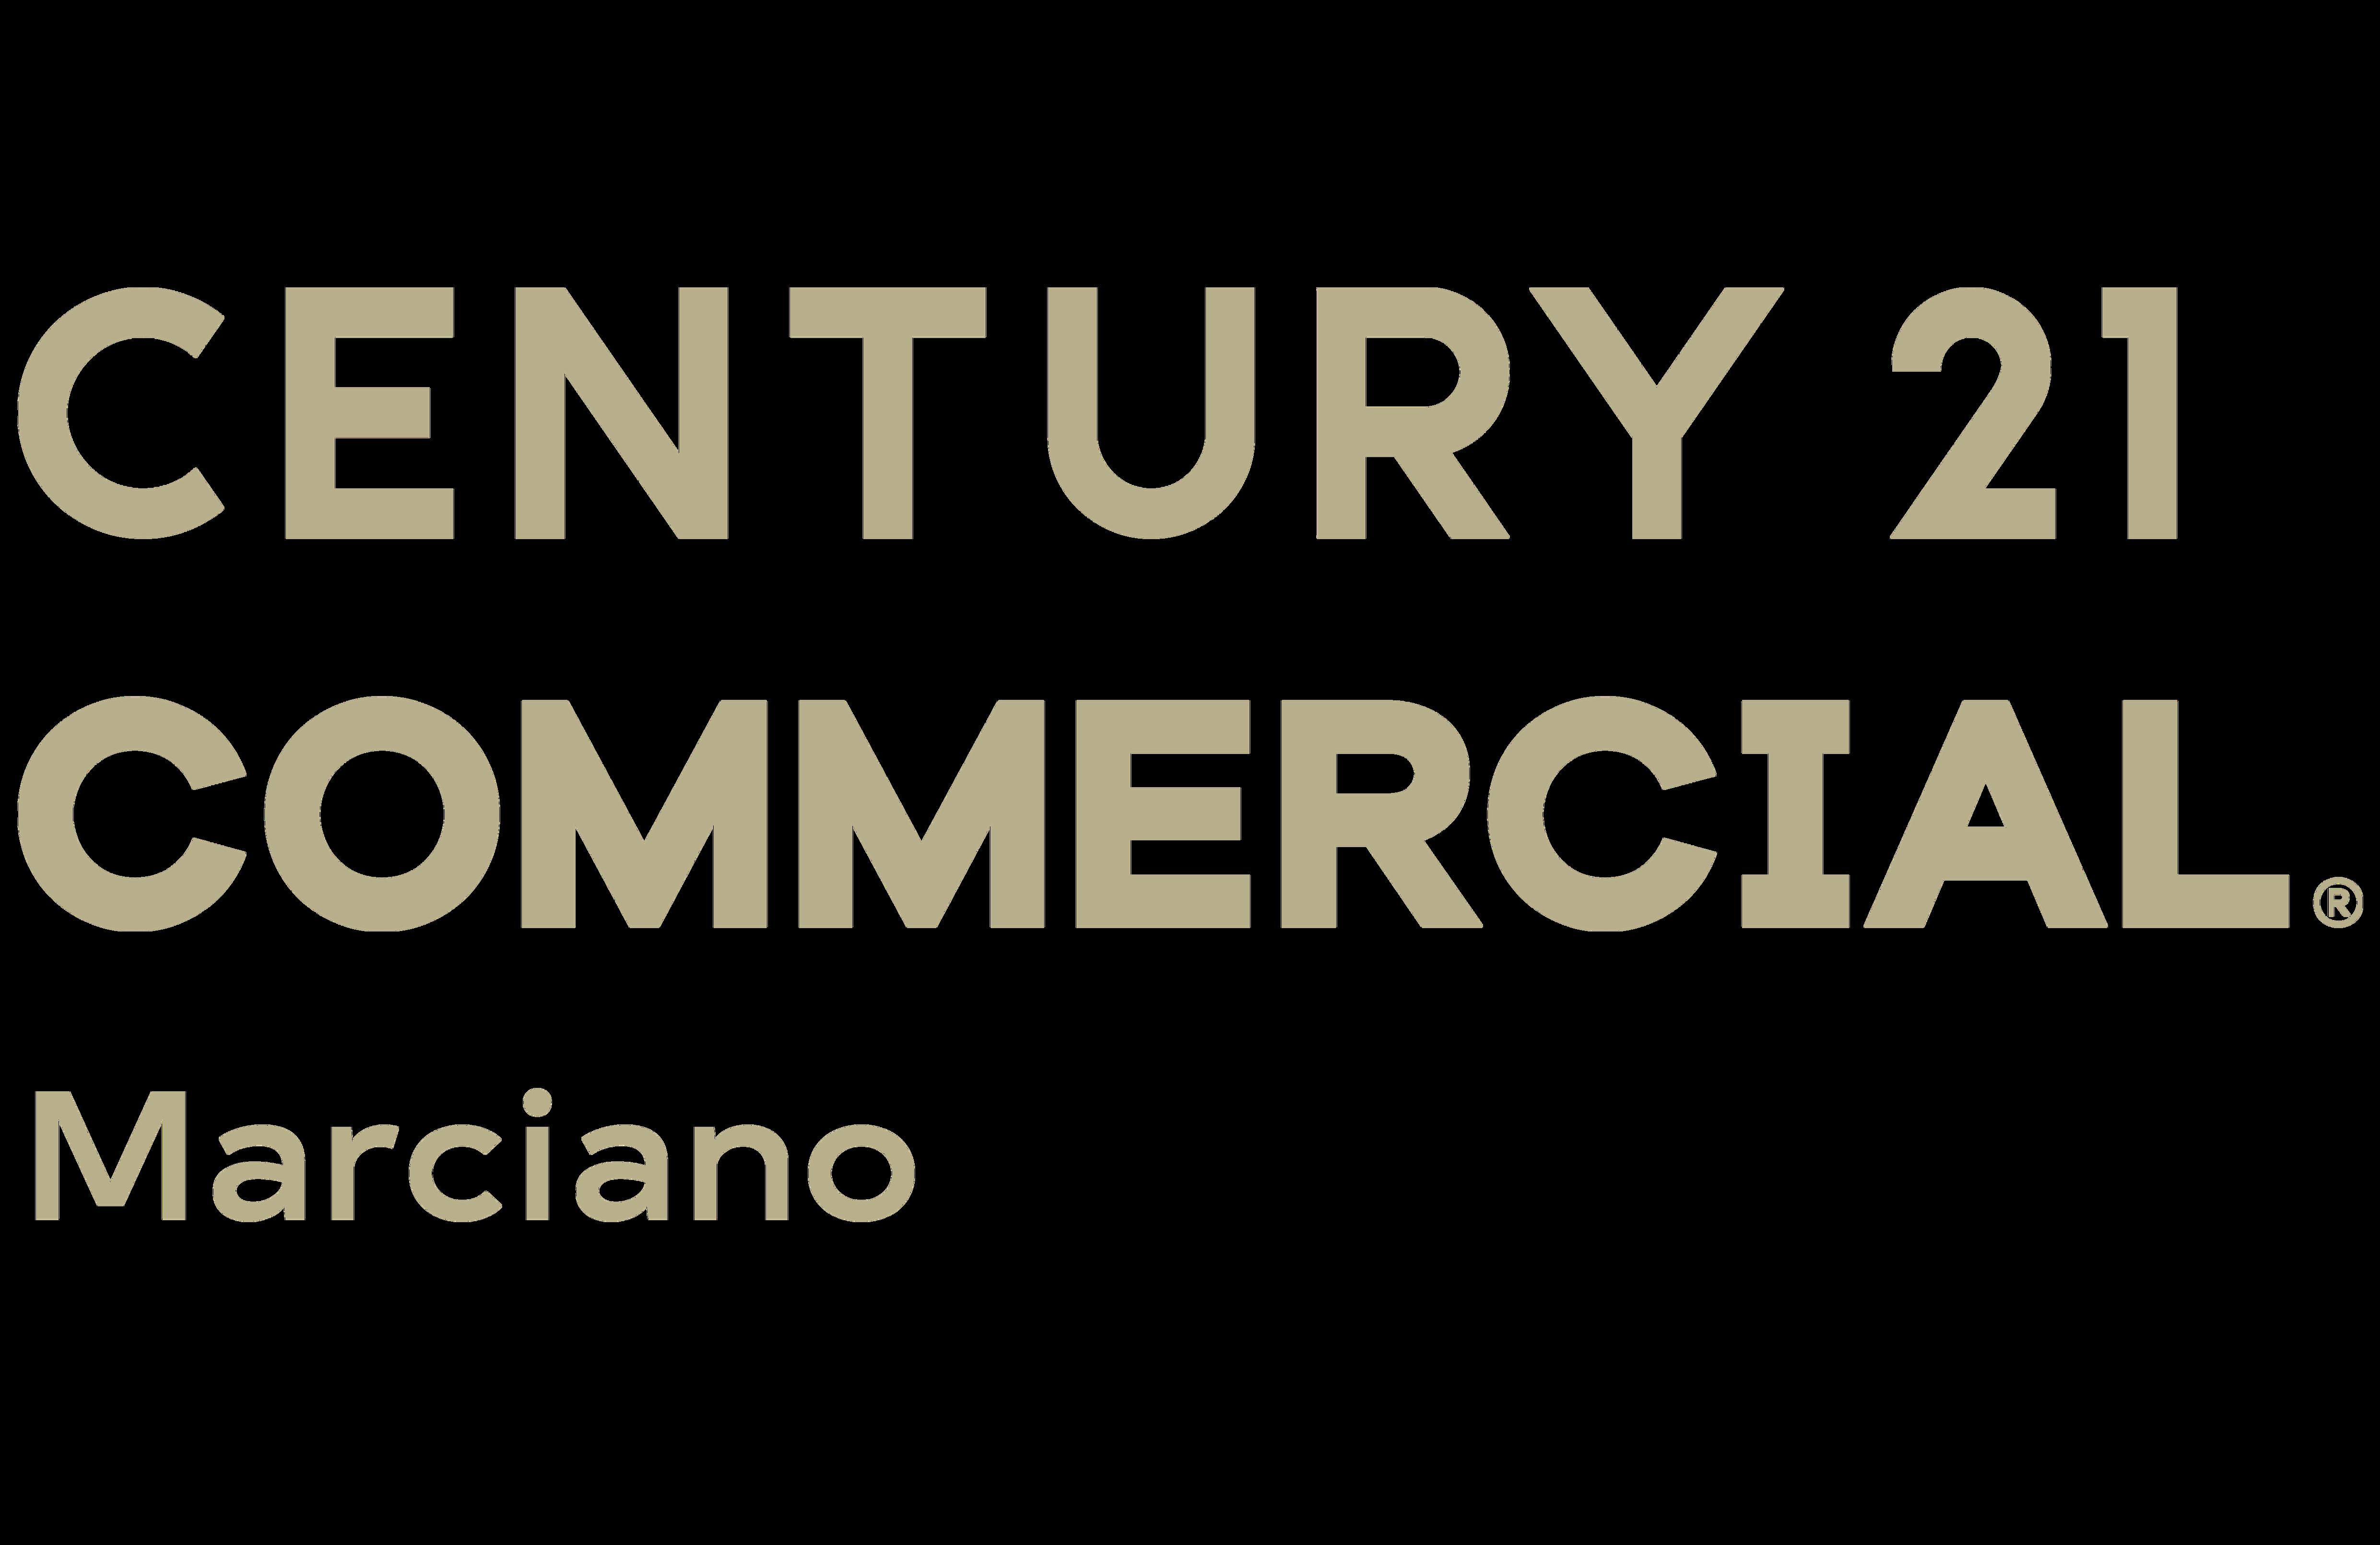 CENTURY 21 Marciano